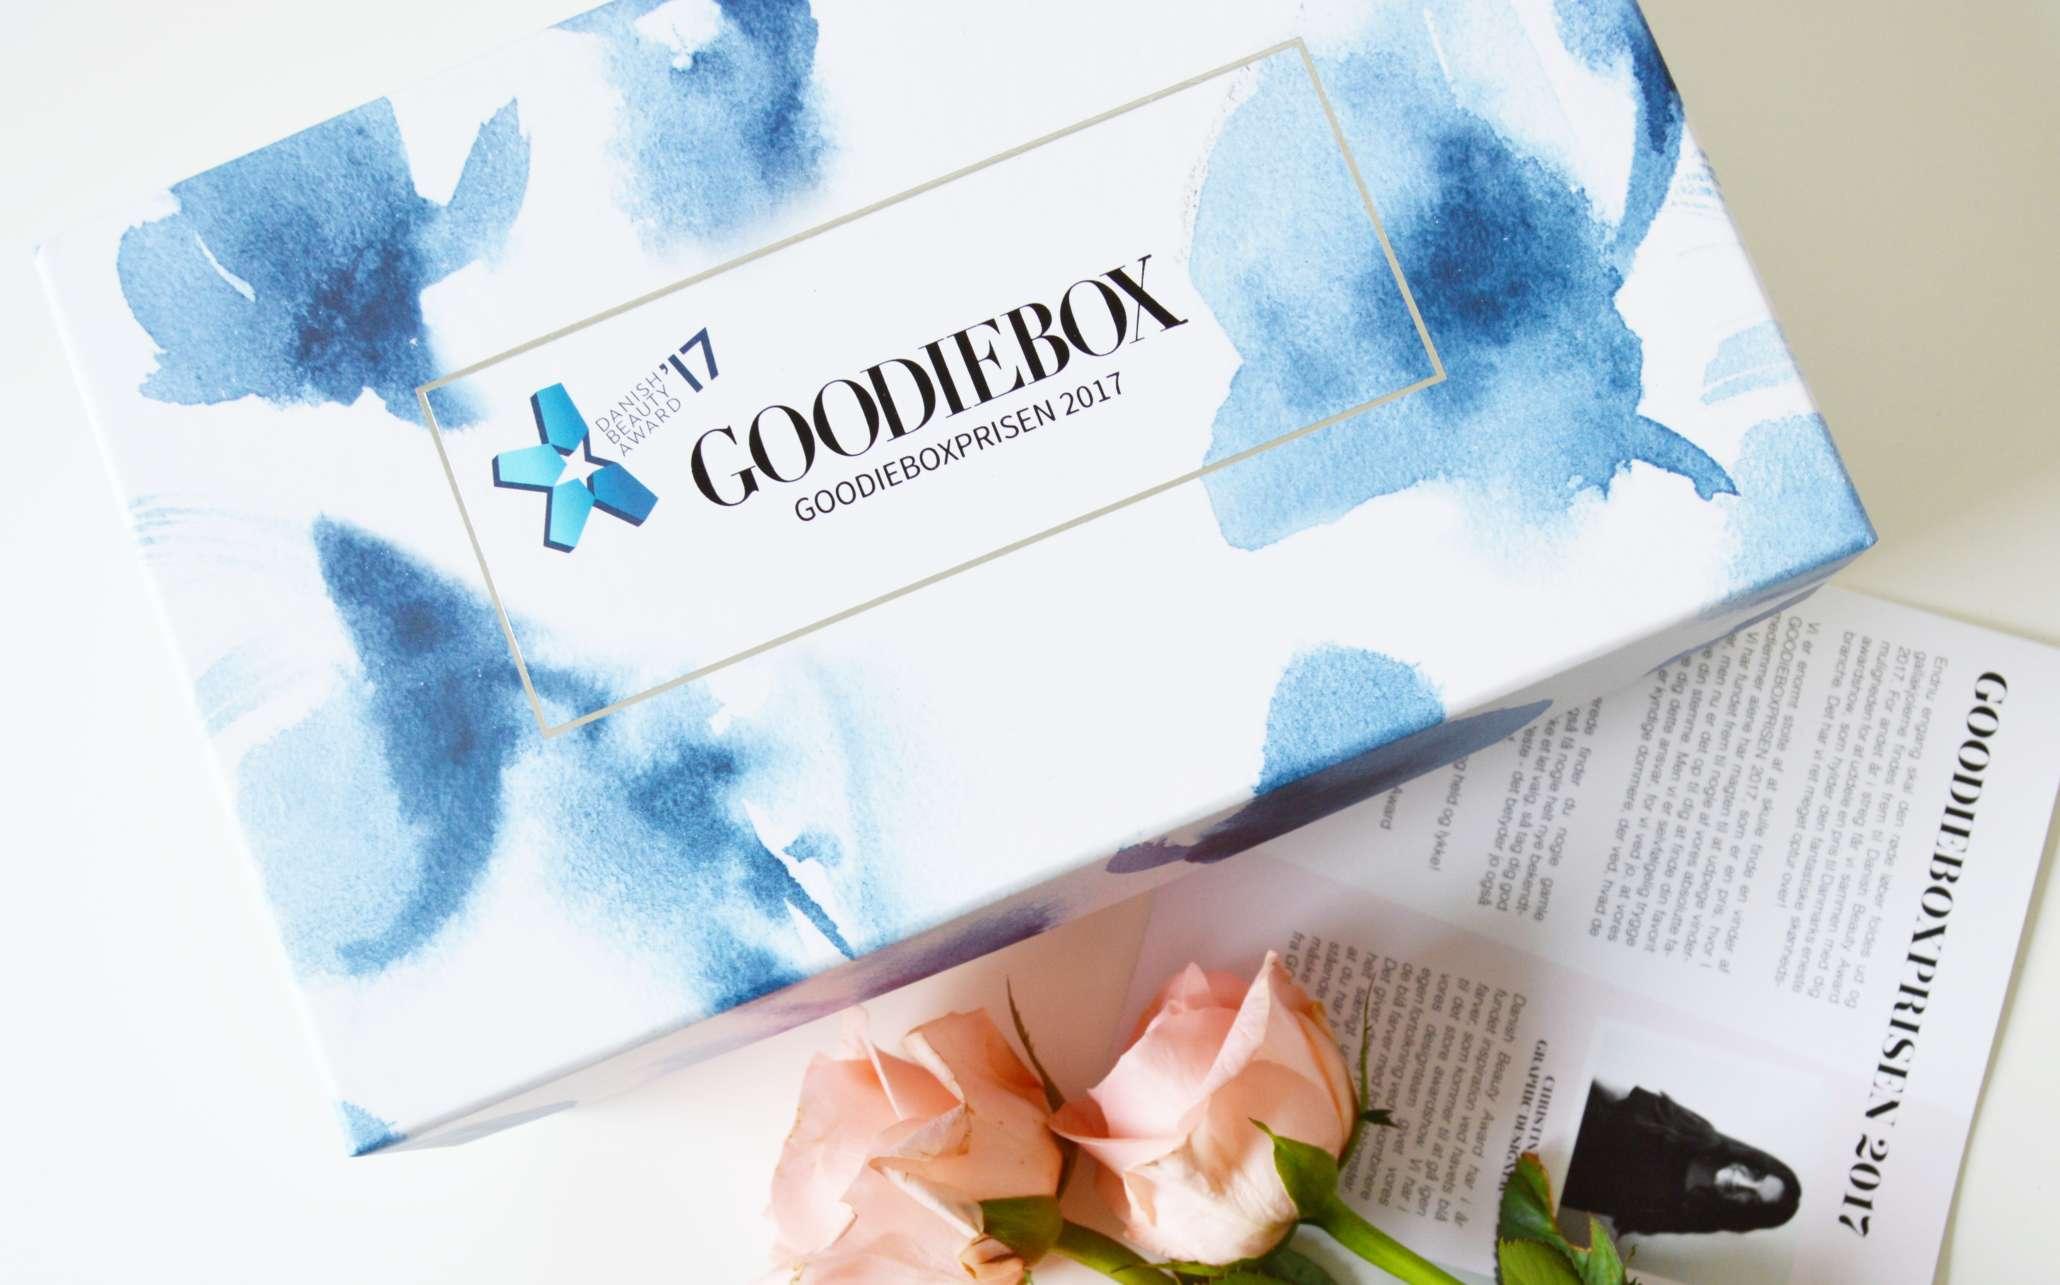 Goodiebox Goodieboxprisen 2017